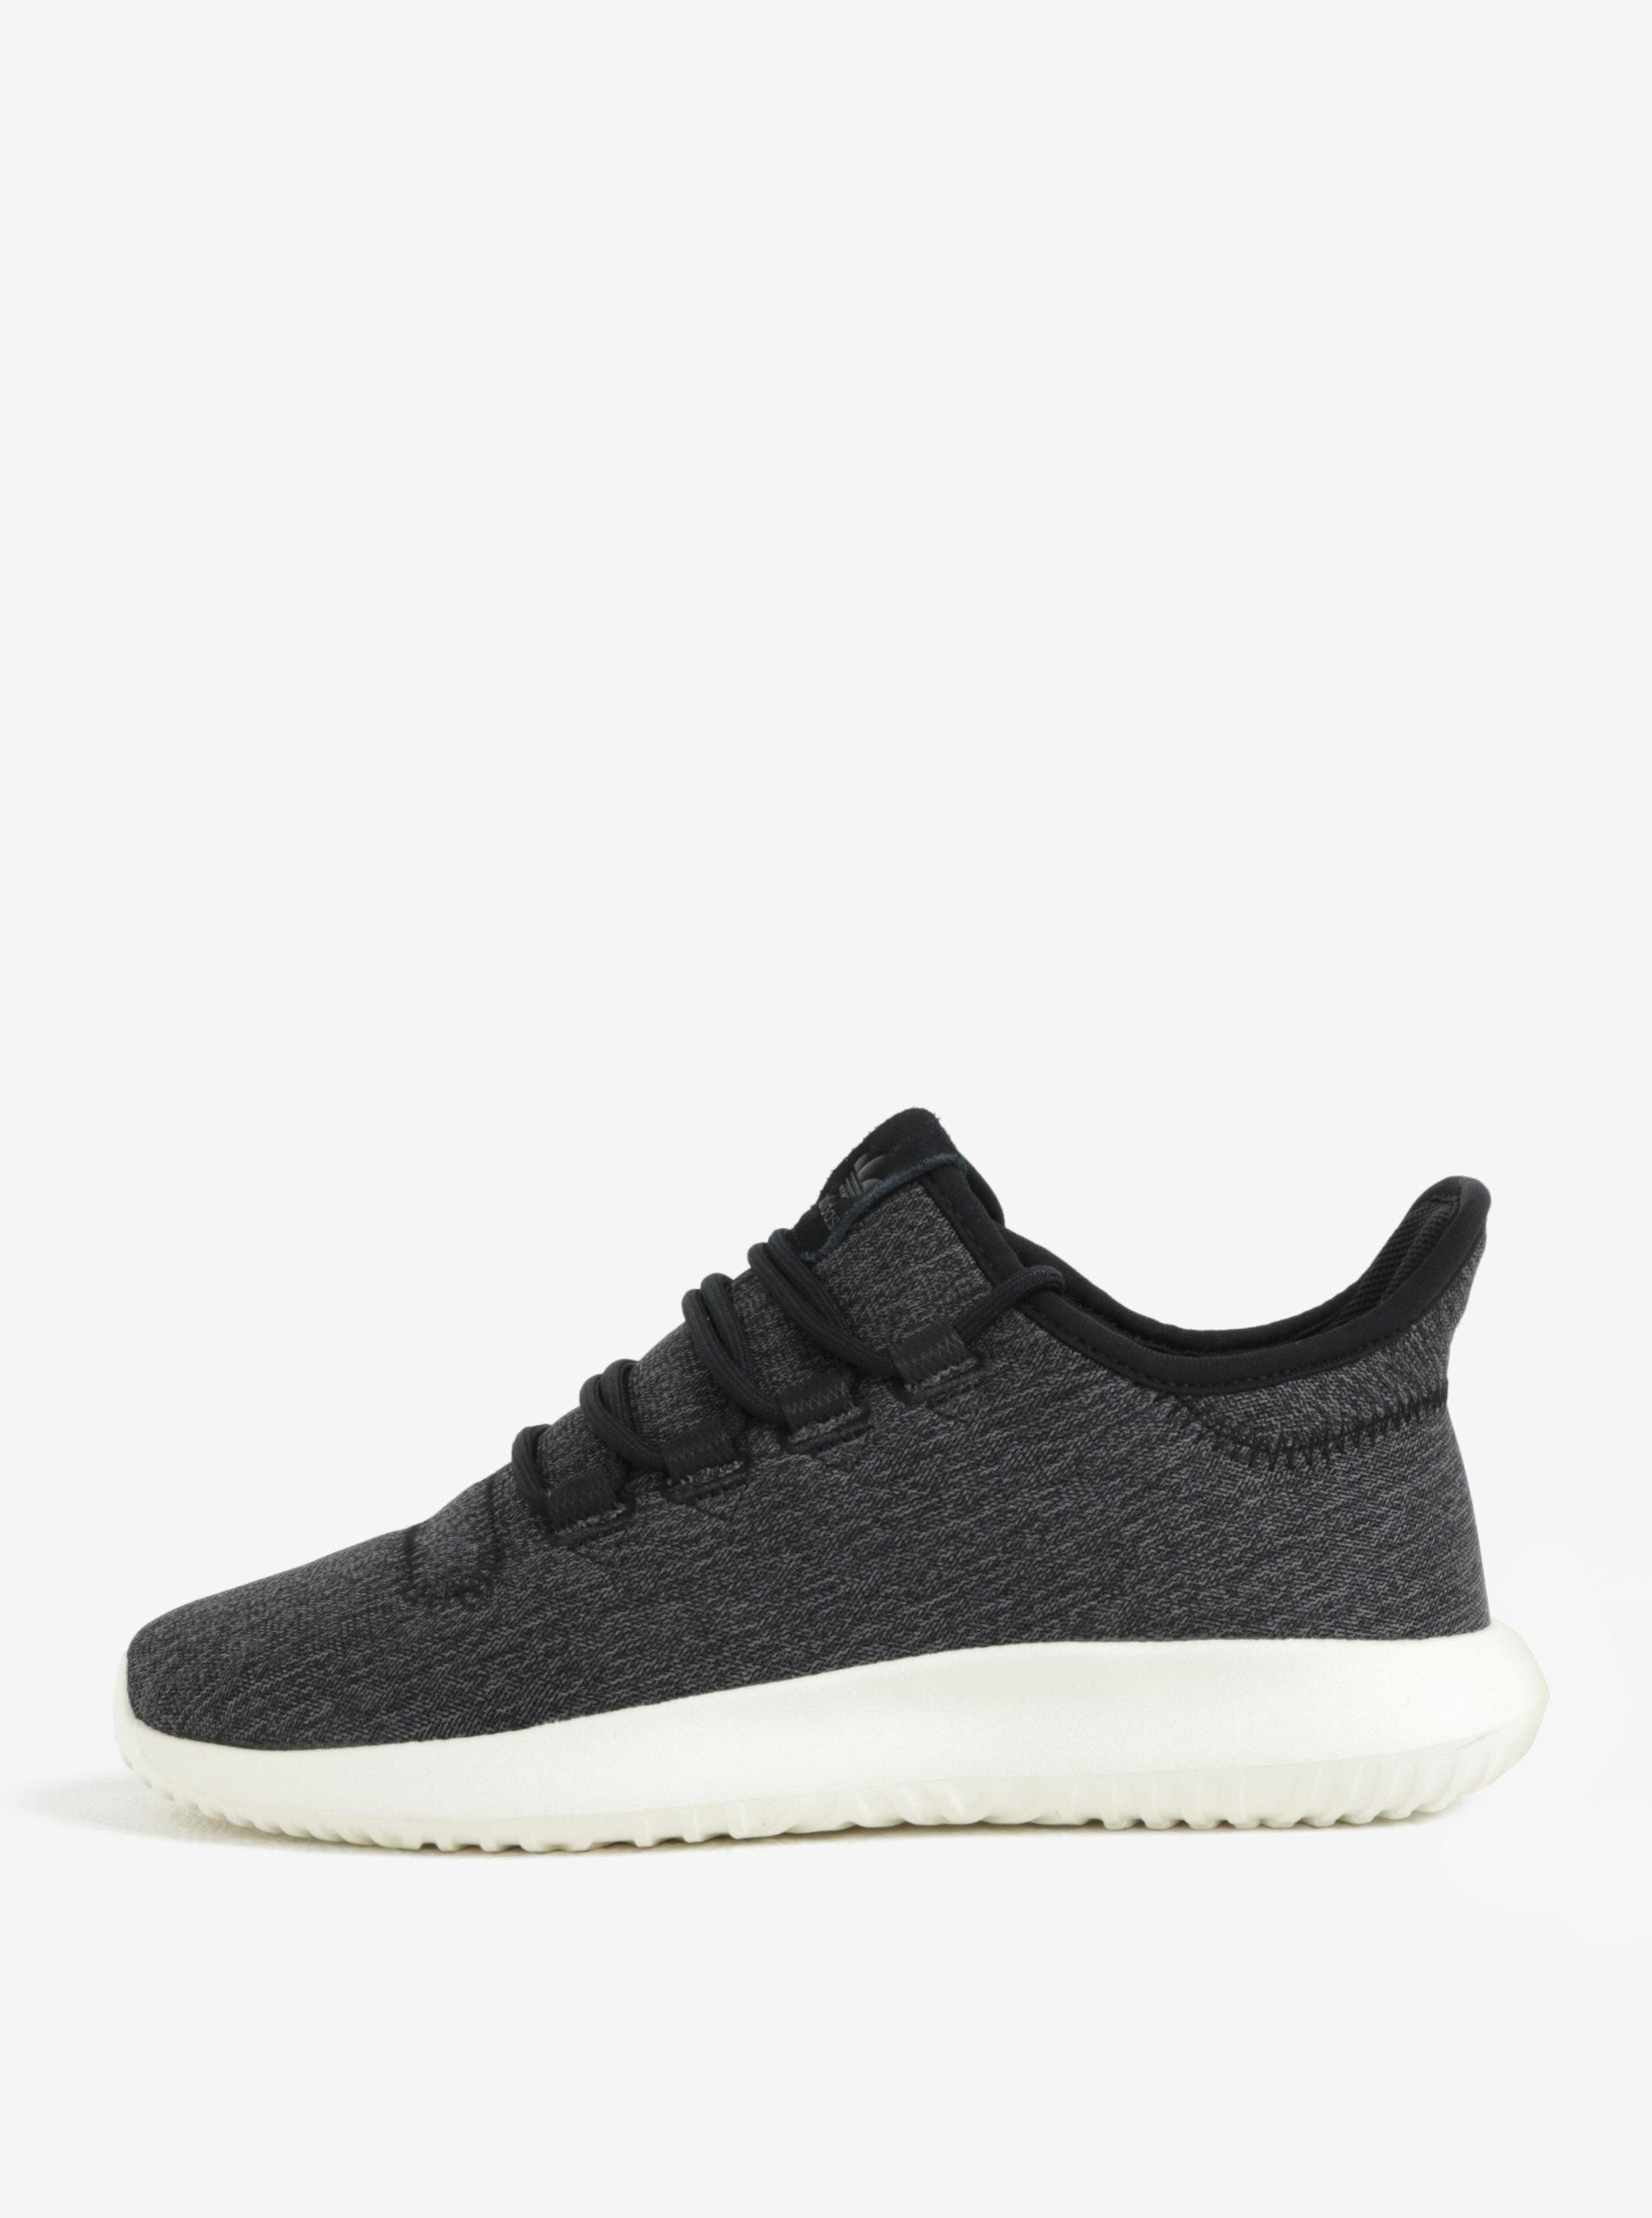 Černé dámské tenisky adidas Originals Tubular Shadow ... a3d06fe8c9e